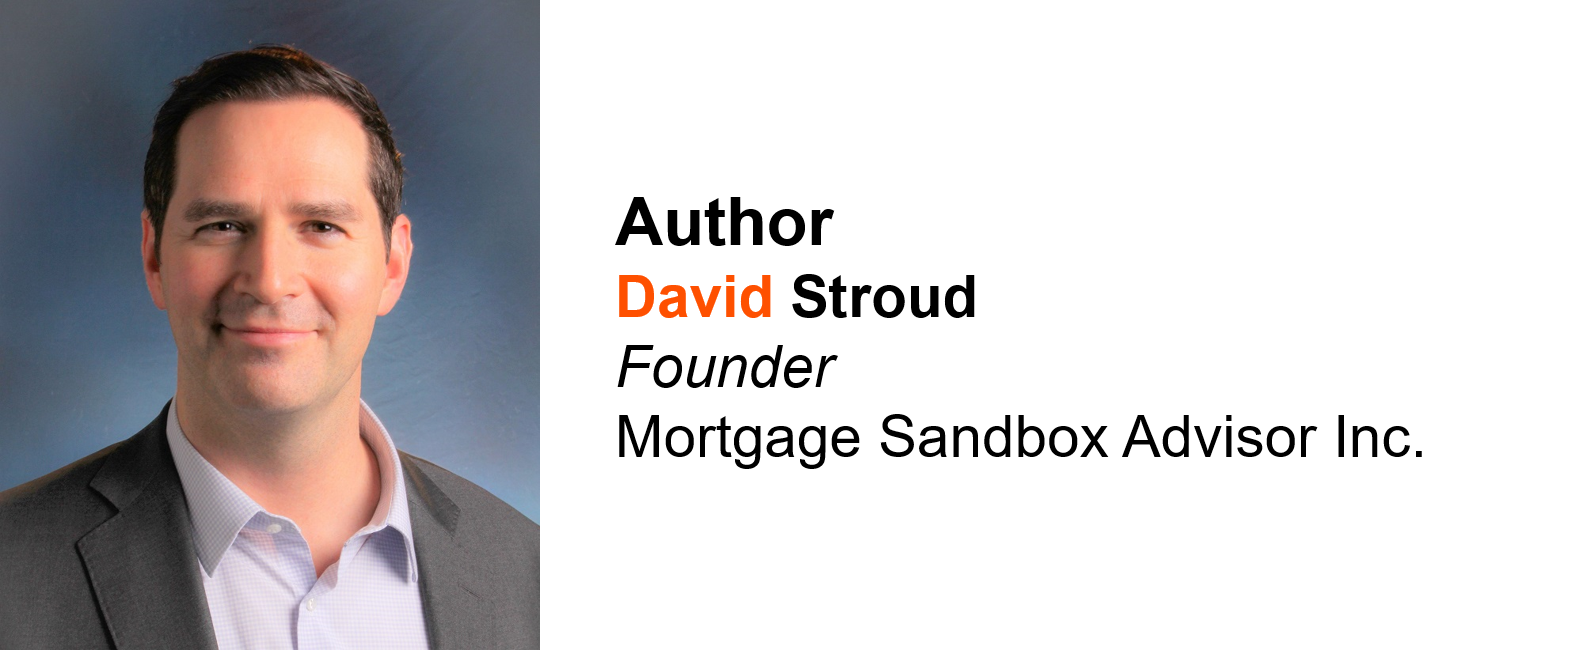 00 Blog Signature (David) Founder.png